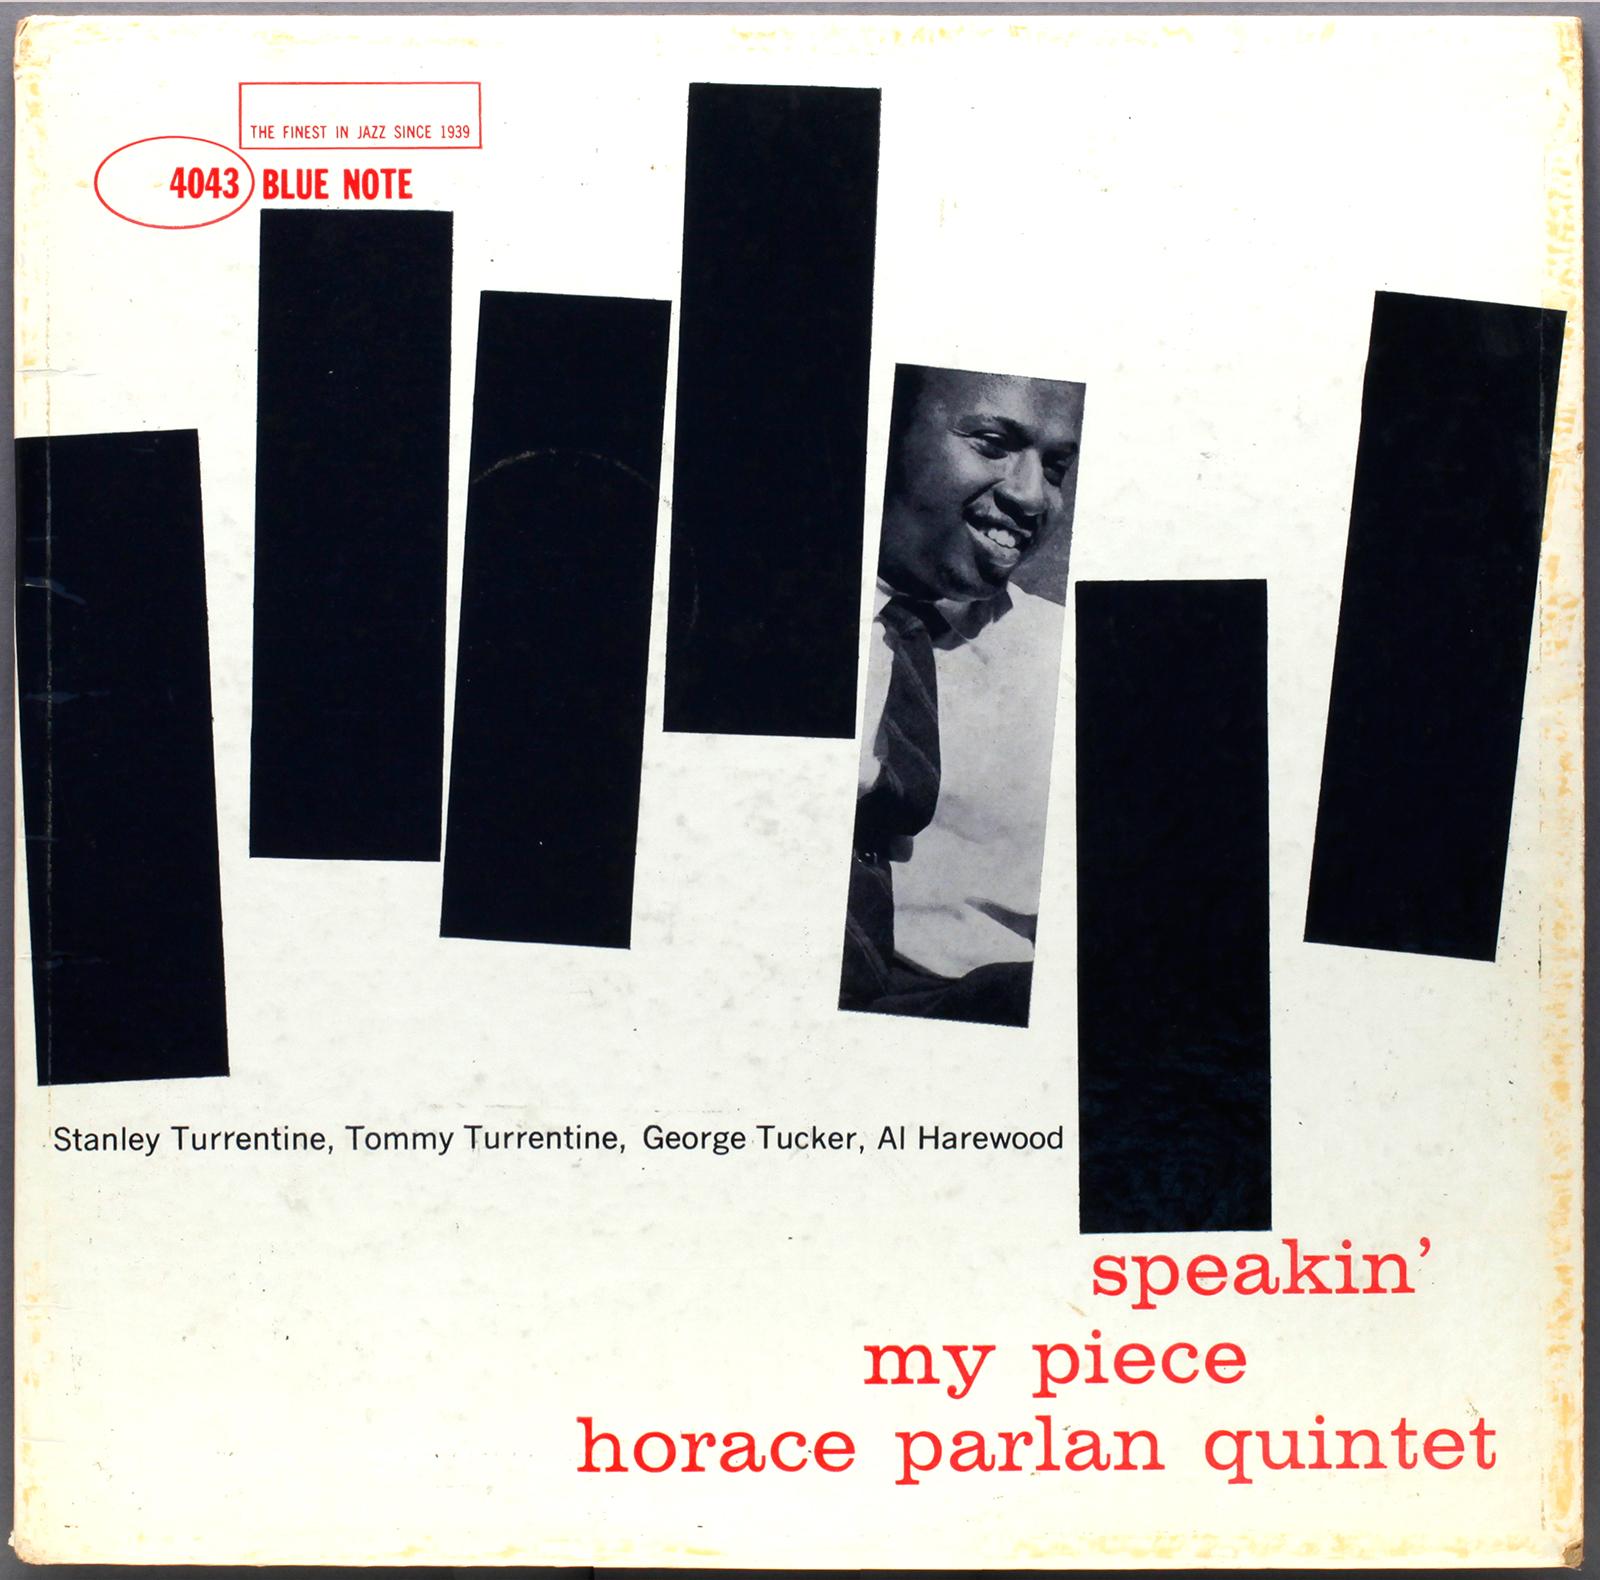 Horace Parlan Speakin My Piece 1960 Blue Note